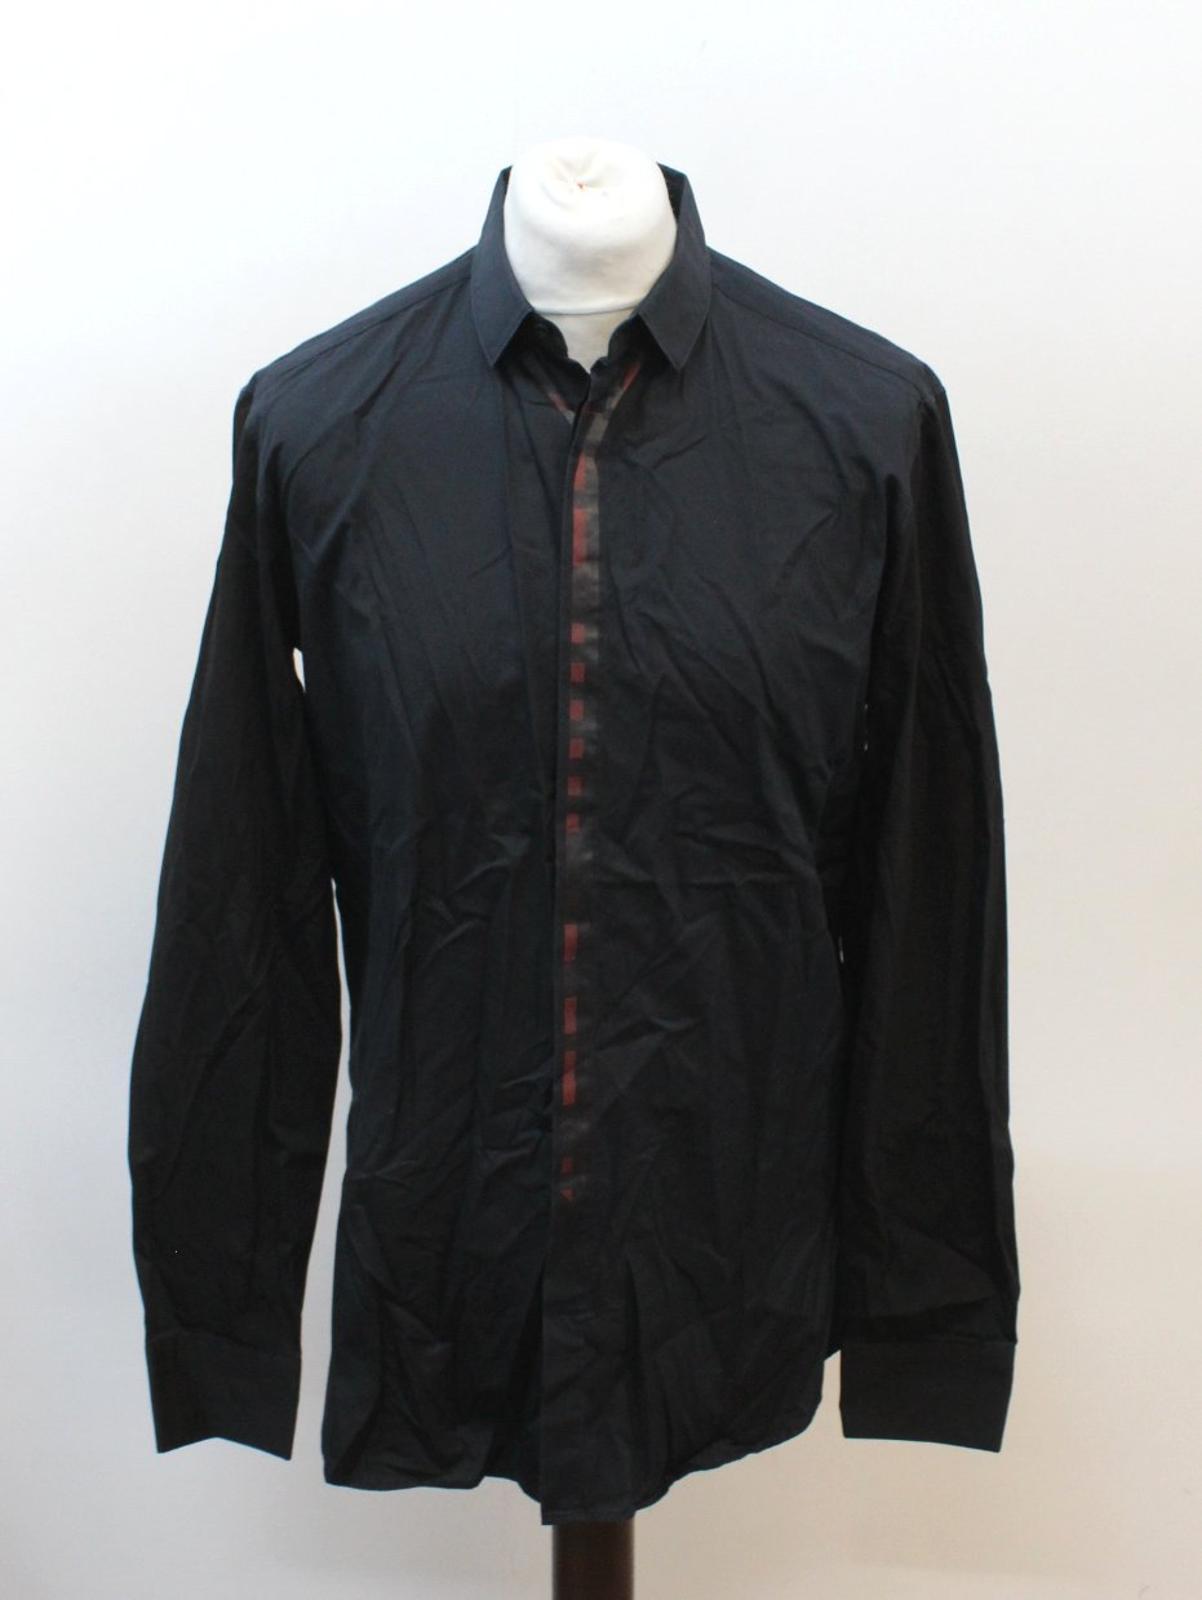 Neil-Barrett-Hombre-Azul-Manga-Negra-Cuello-Camisa-de-impresion-Corbata-Slim-Fit-16-5-034-42cm miniatura 10